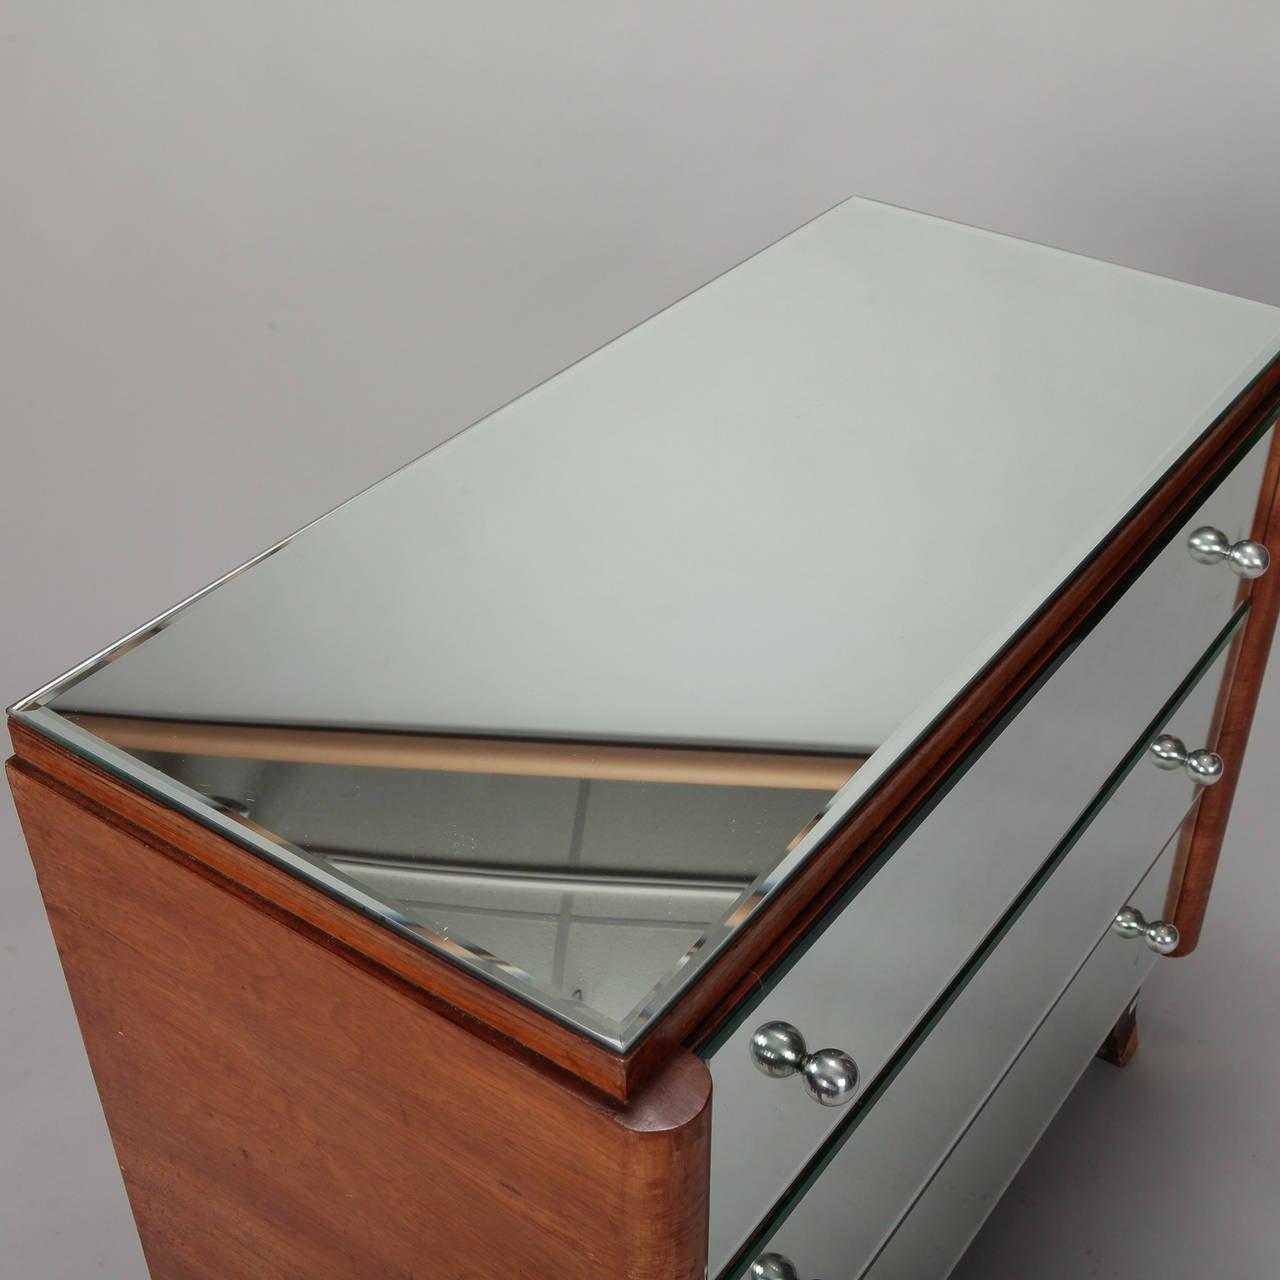 European Art Deco Era Mirrored Walnut Chest of Drawers